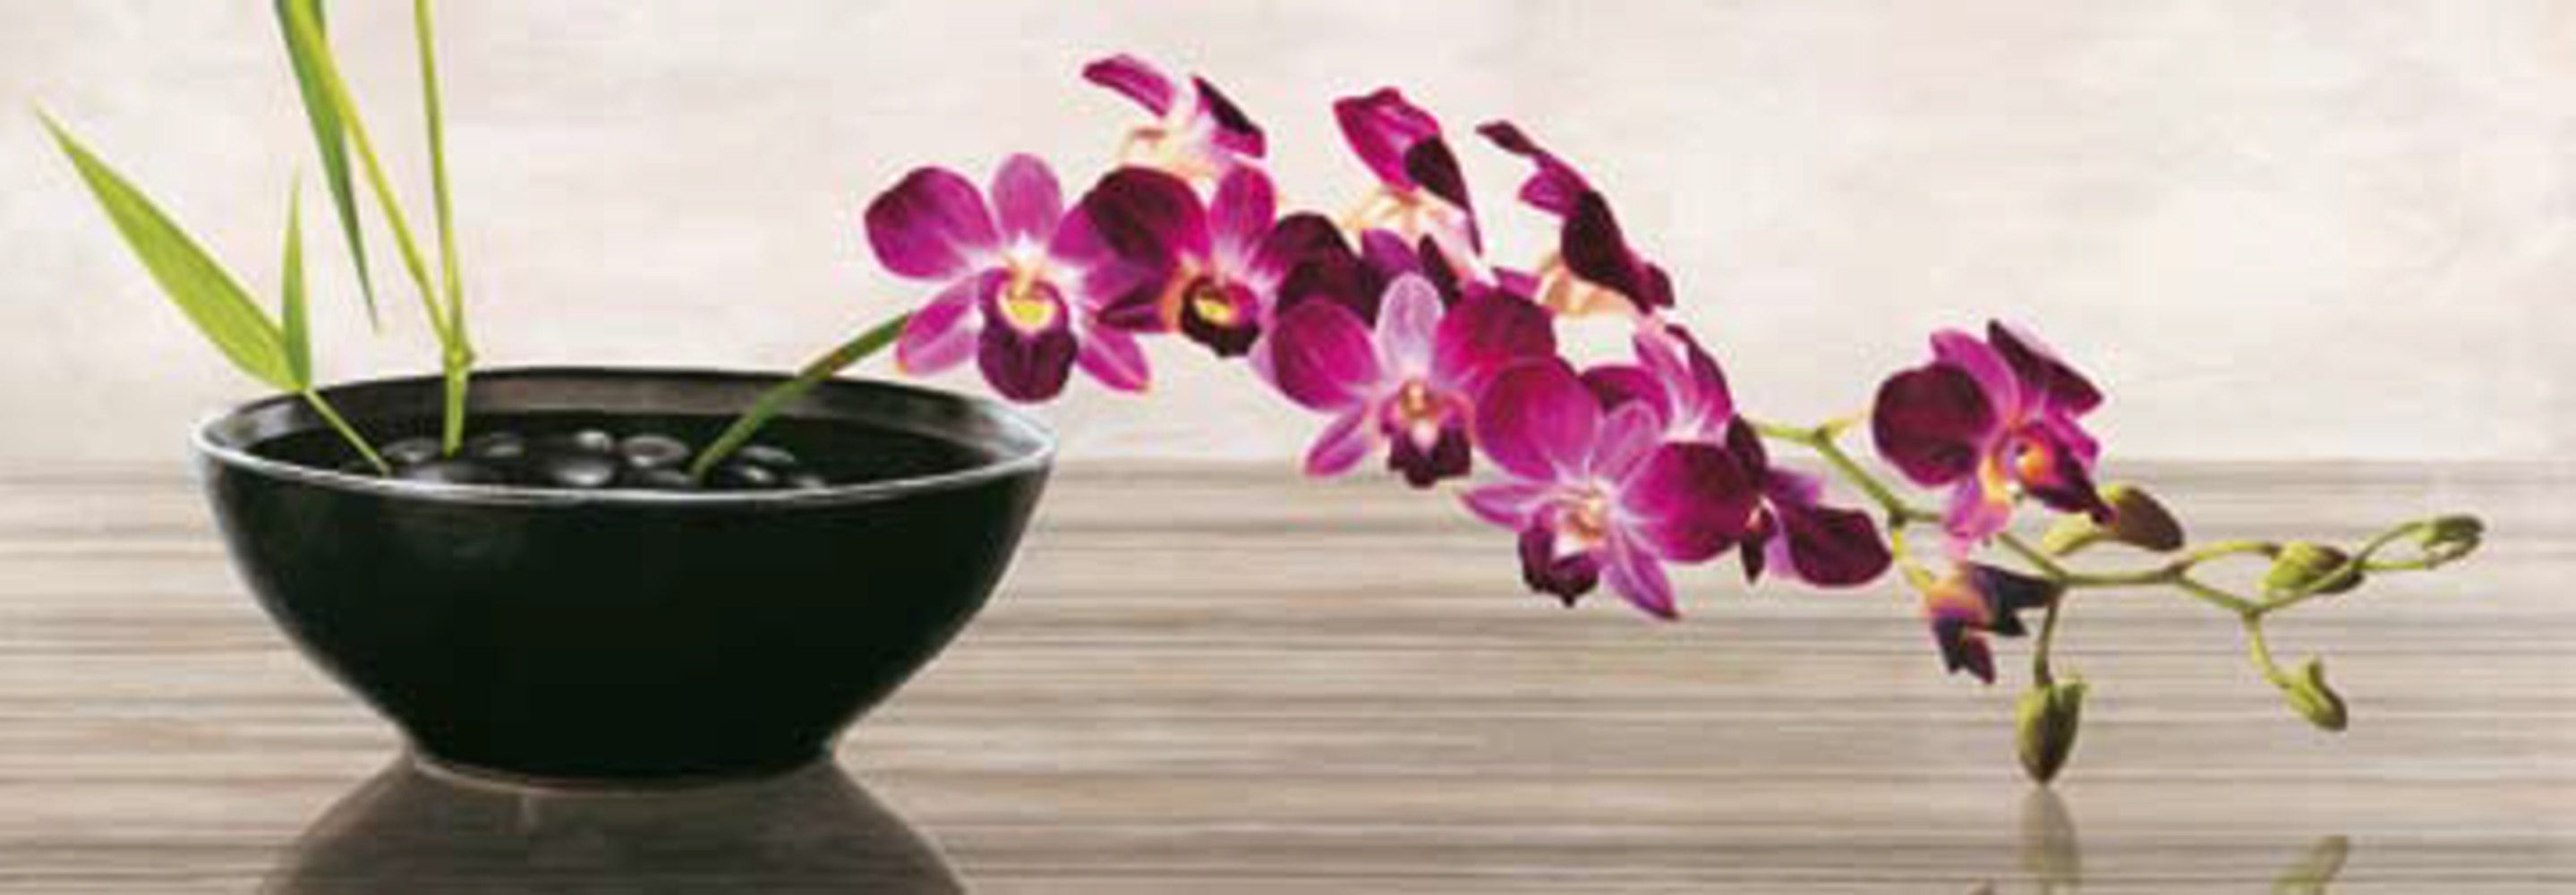 Home Affaire Bild Kunstdruck »Shin Mills, Orchid Arrangement«, 95/33 cm